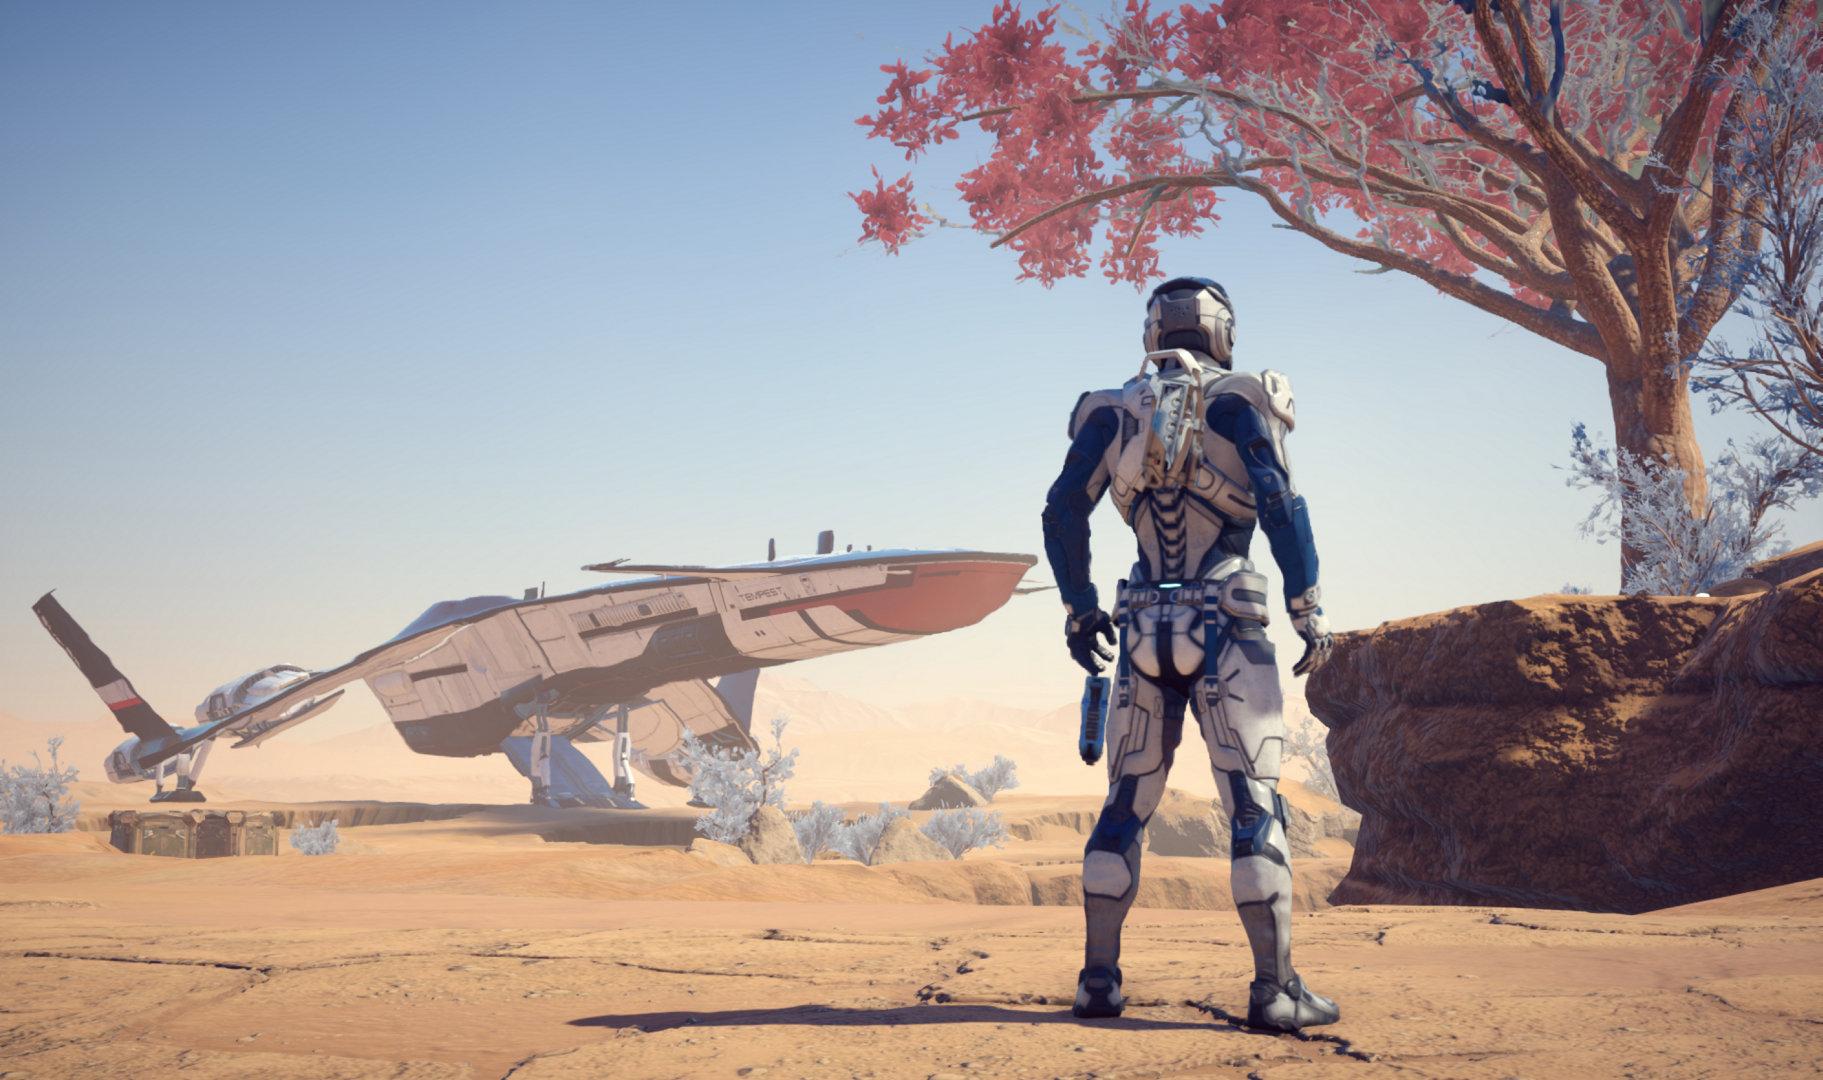 Mass-Effect-Andromeda_2016_09-07-16_001.